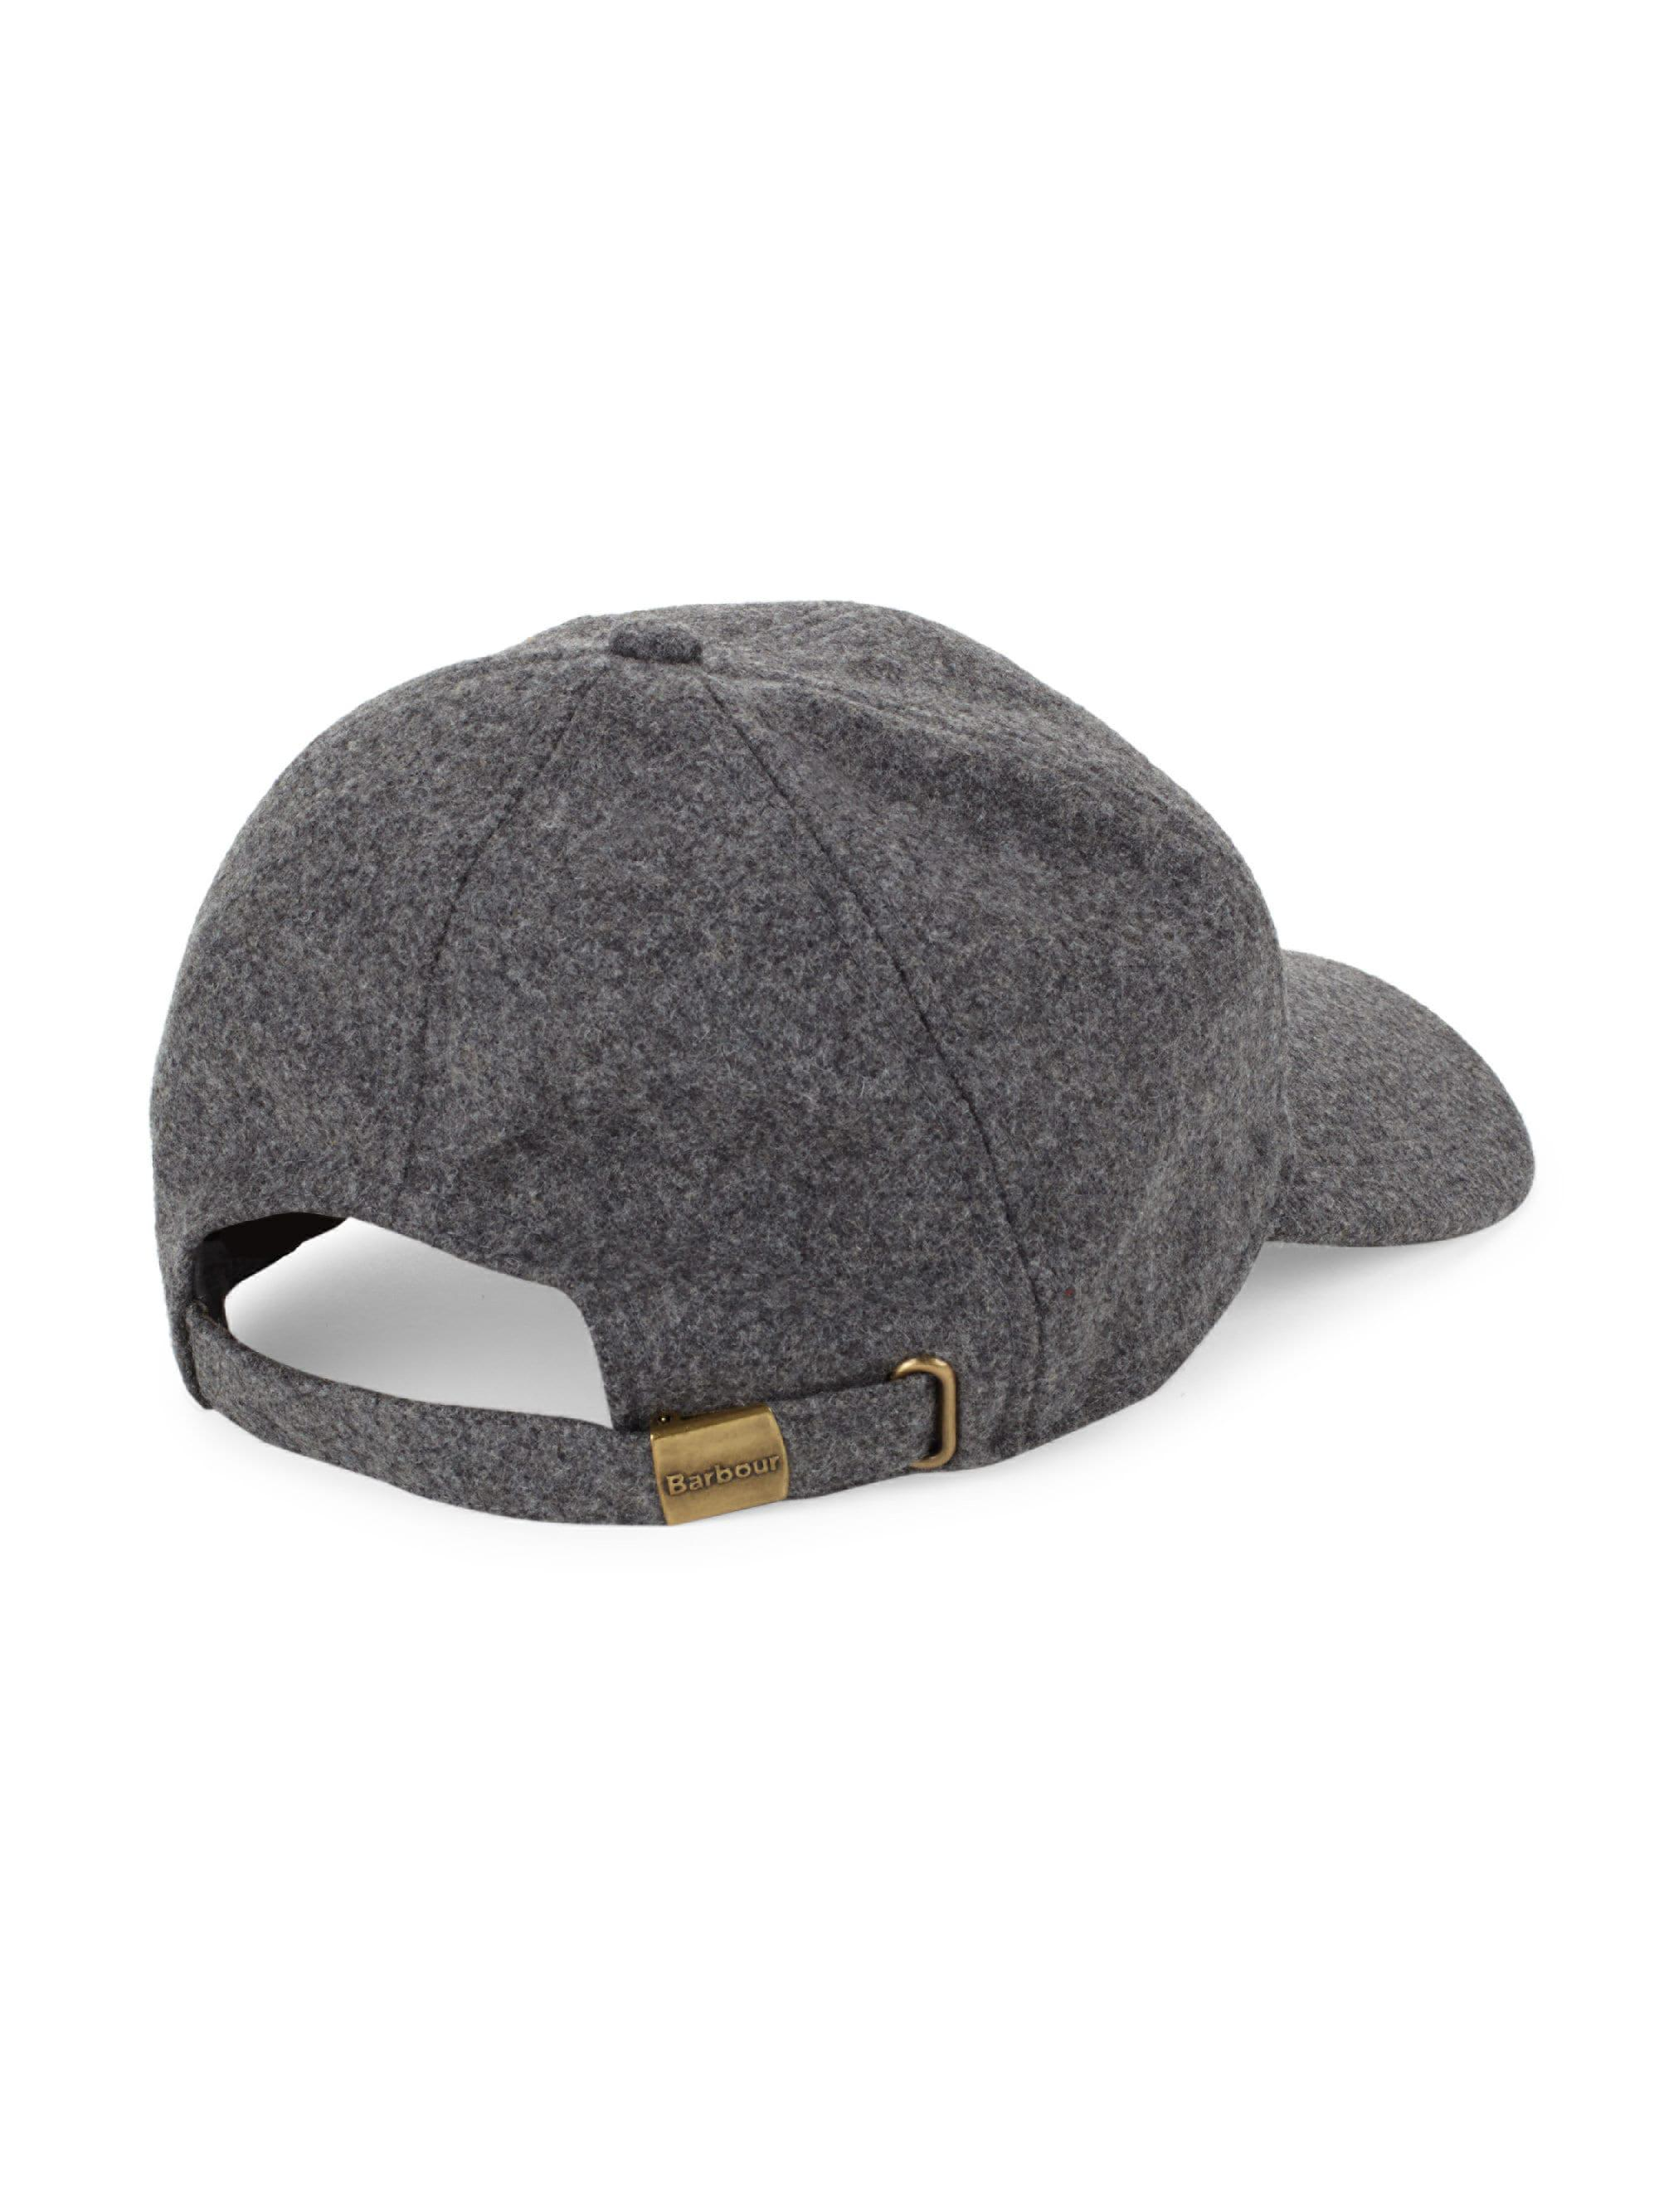 919ebc5633f Barbour Coopworth Wool-blend Sports Cap in Gray for Men - Lyst